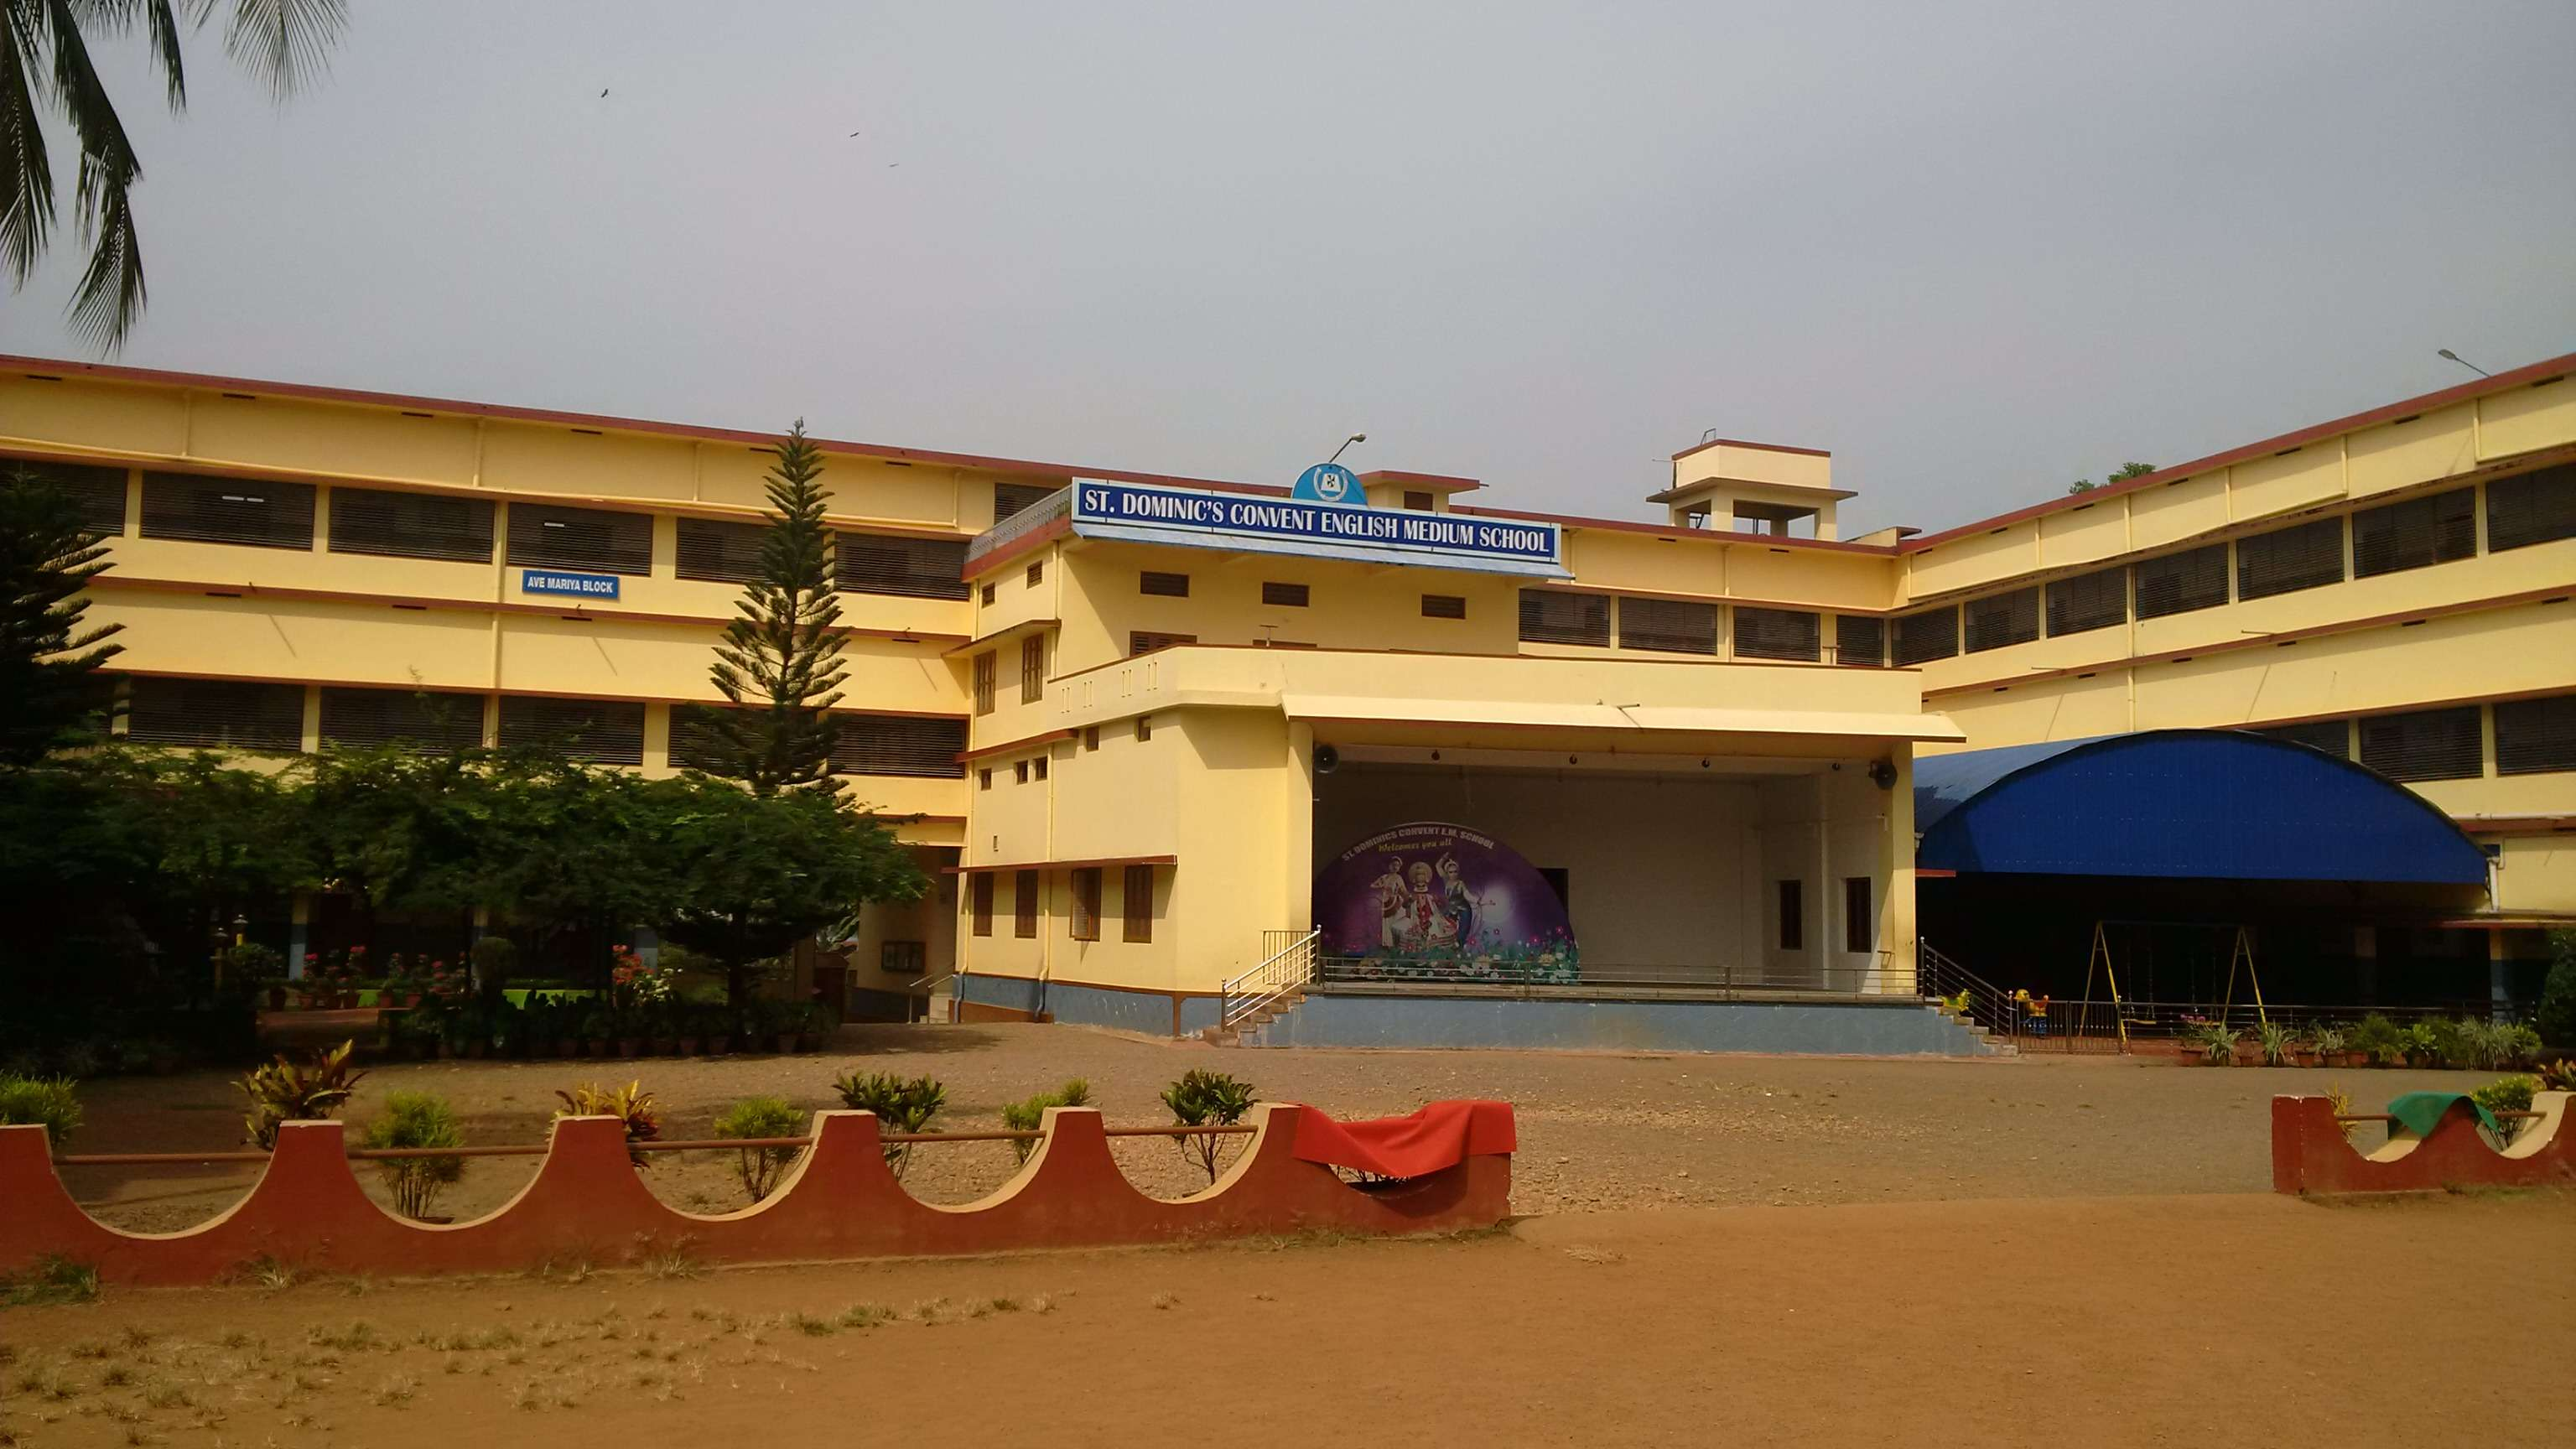 st  dominics convent eng med  school sreekrishnapuram po